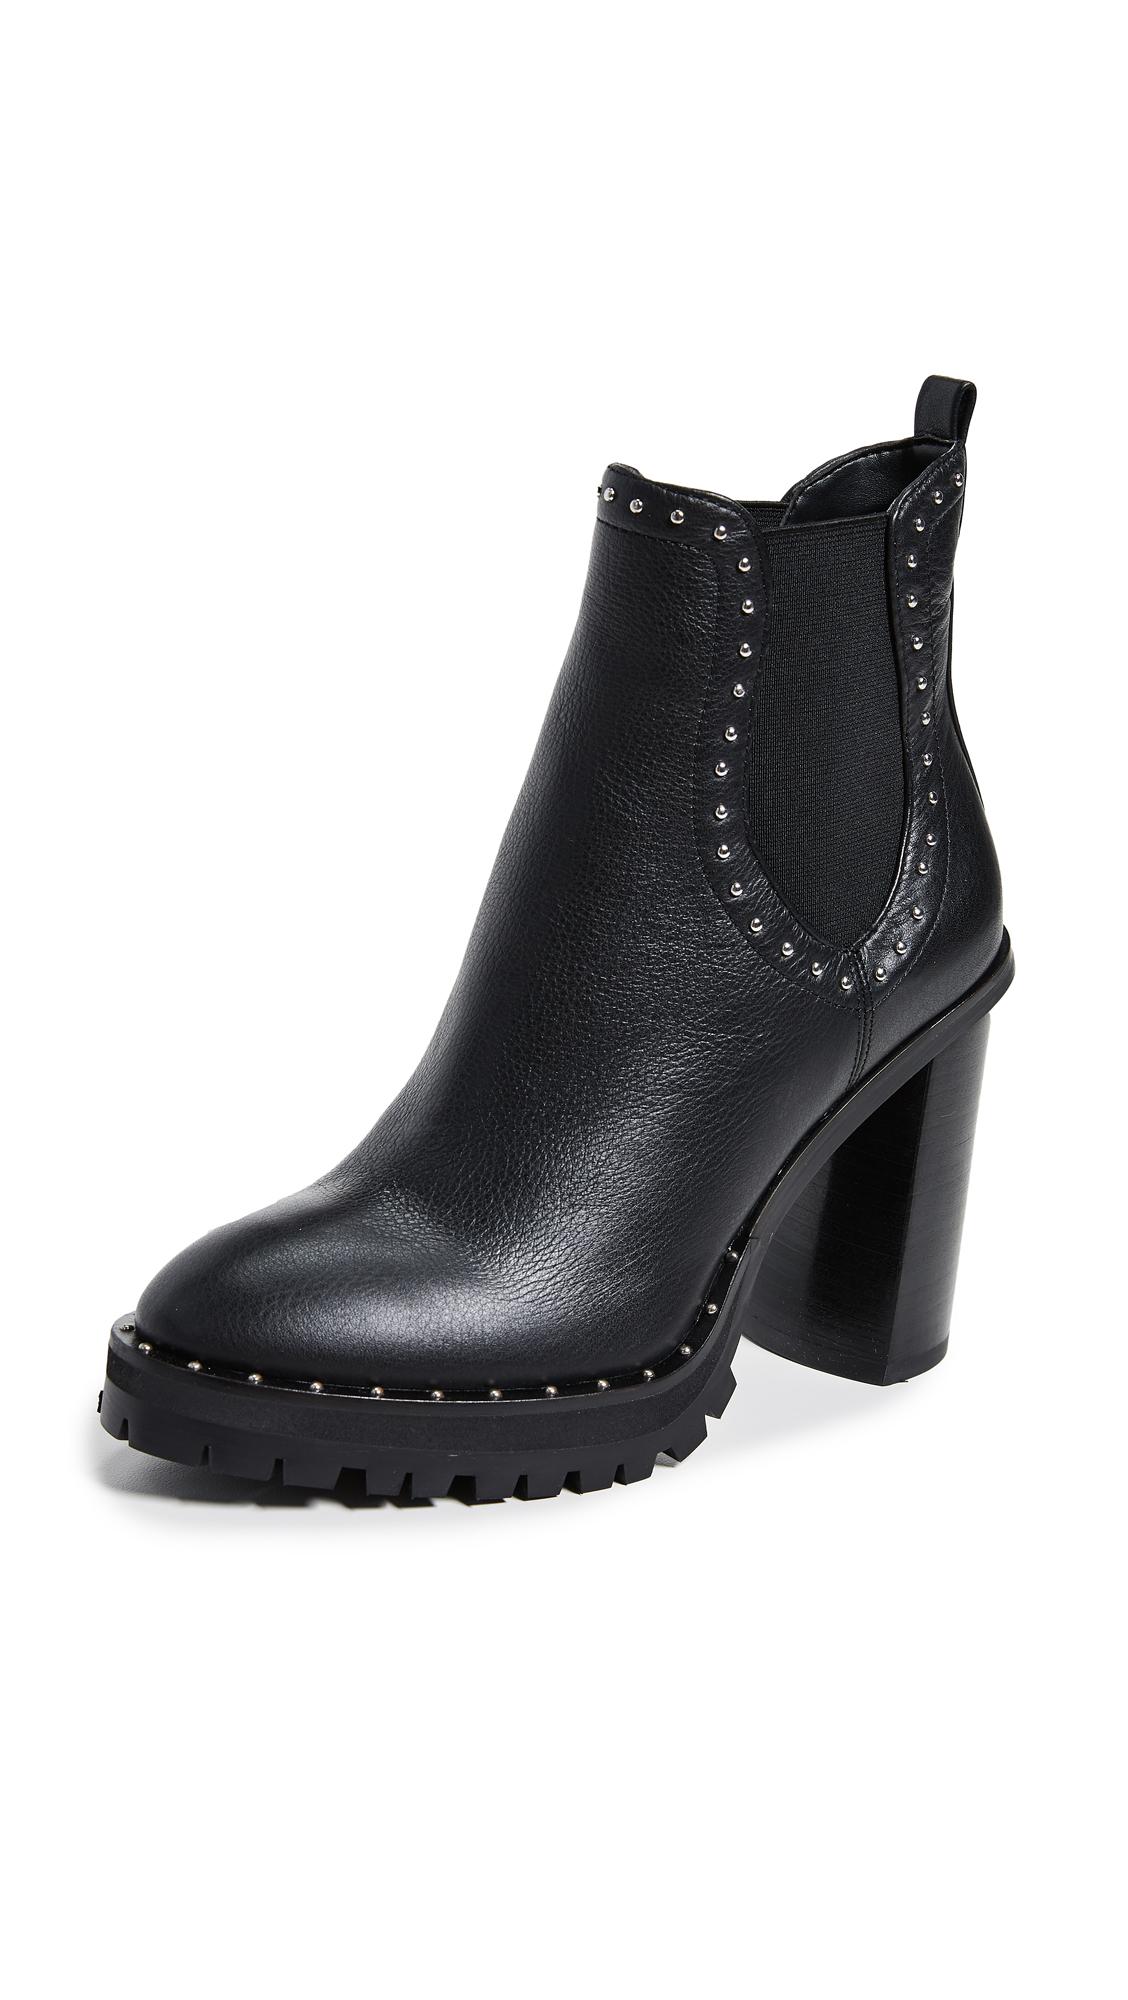 Rebecca Minkoff Edolie Block Heel Chelsea Boots - Black